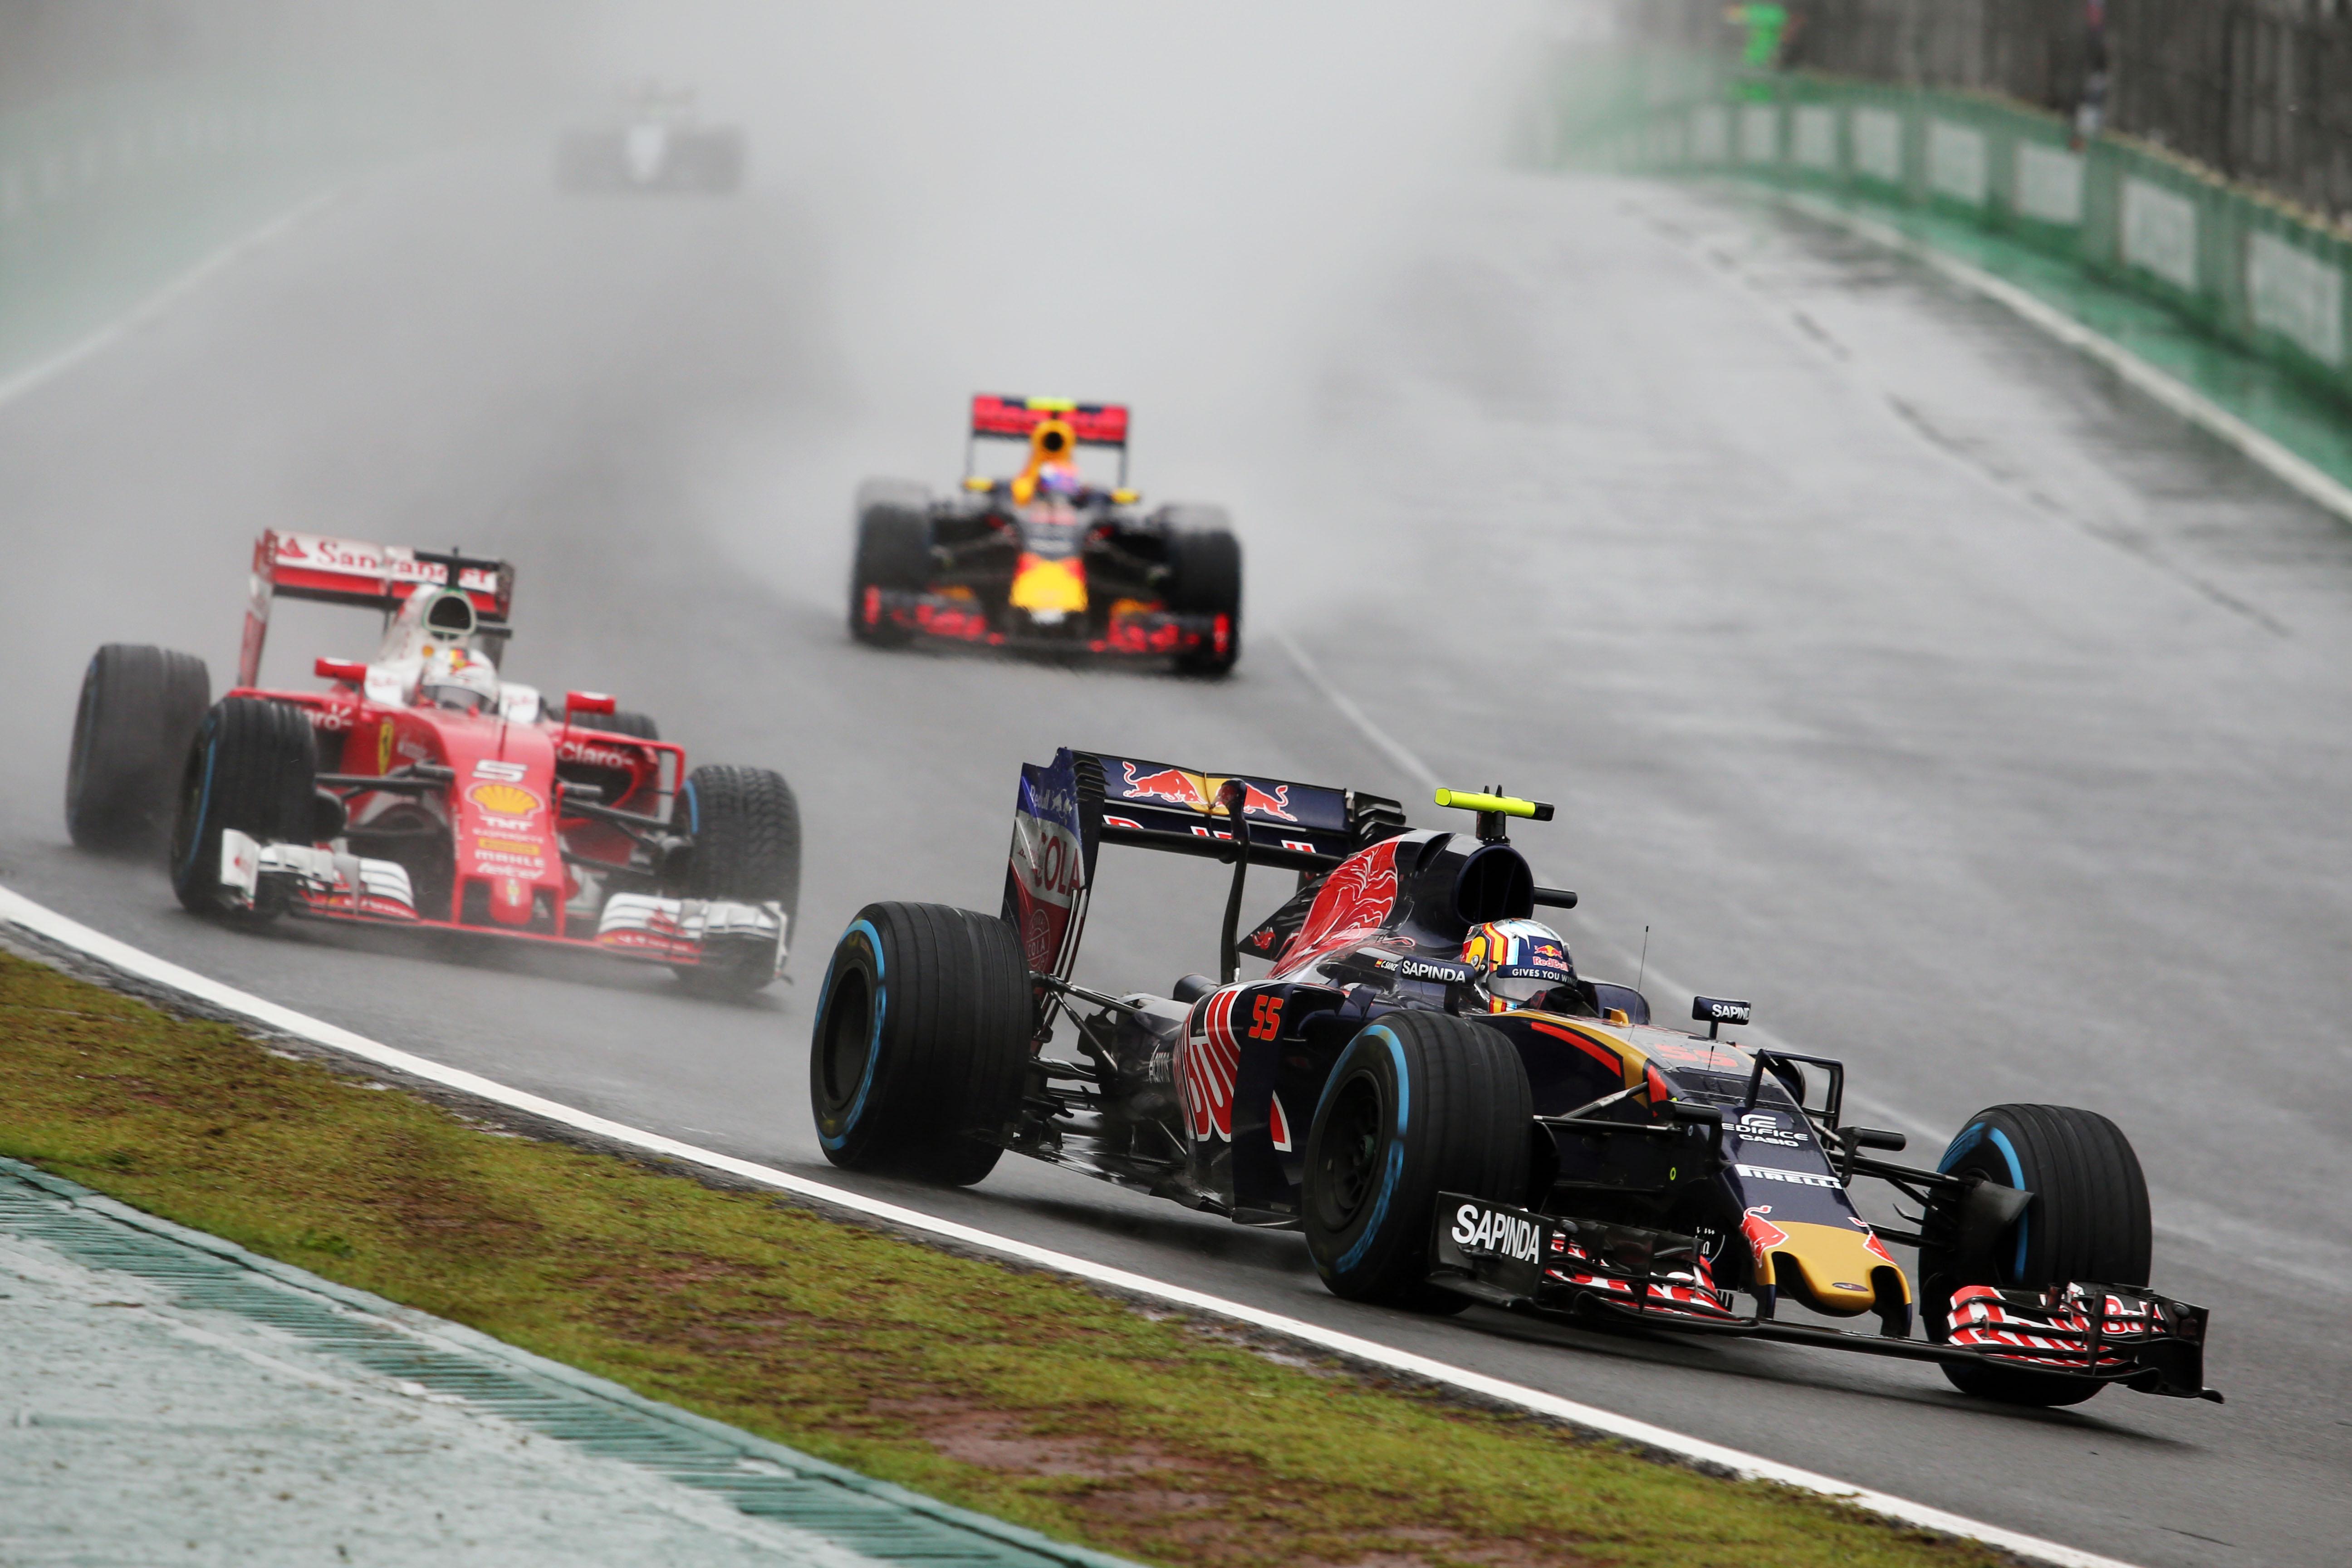 Carlos Sainz Jr Toro Rosso Brazilian Grand Prix 2016 Interlagos